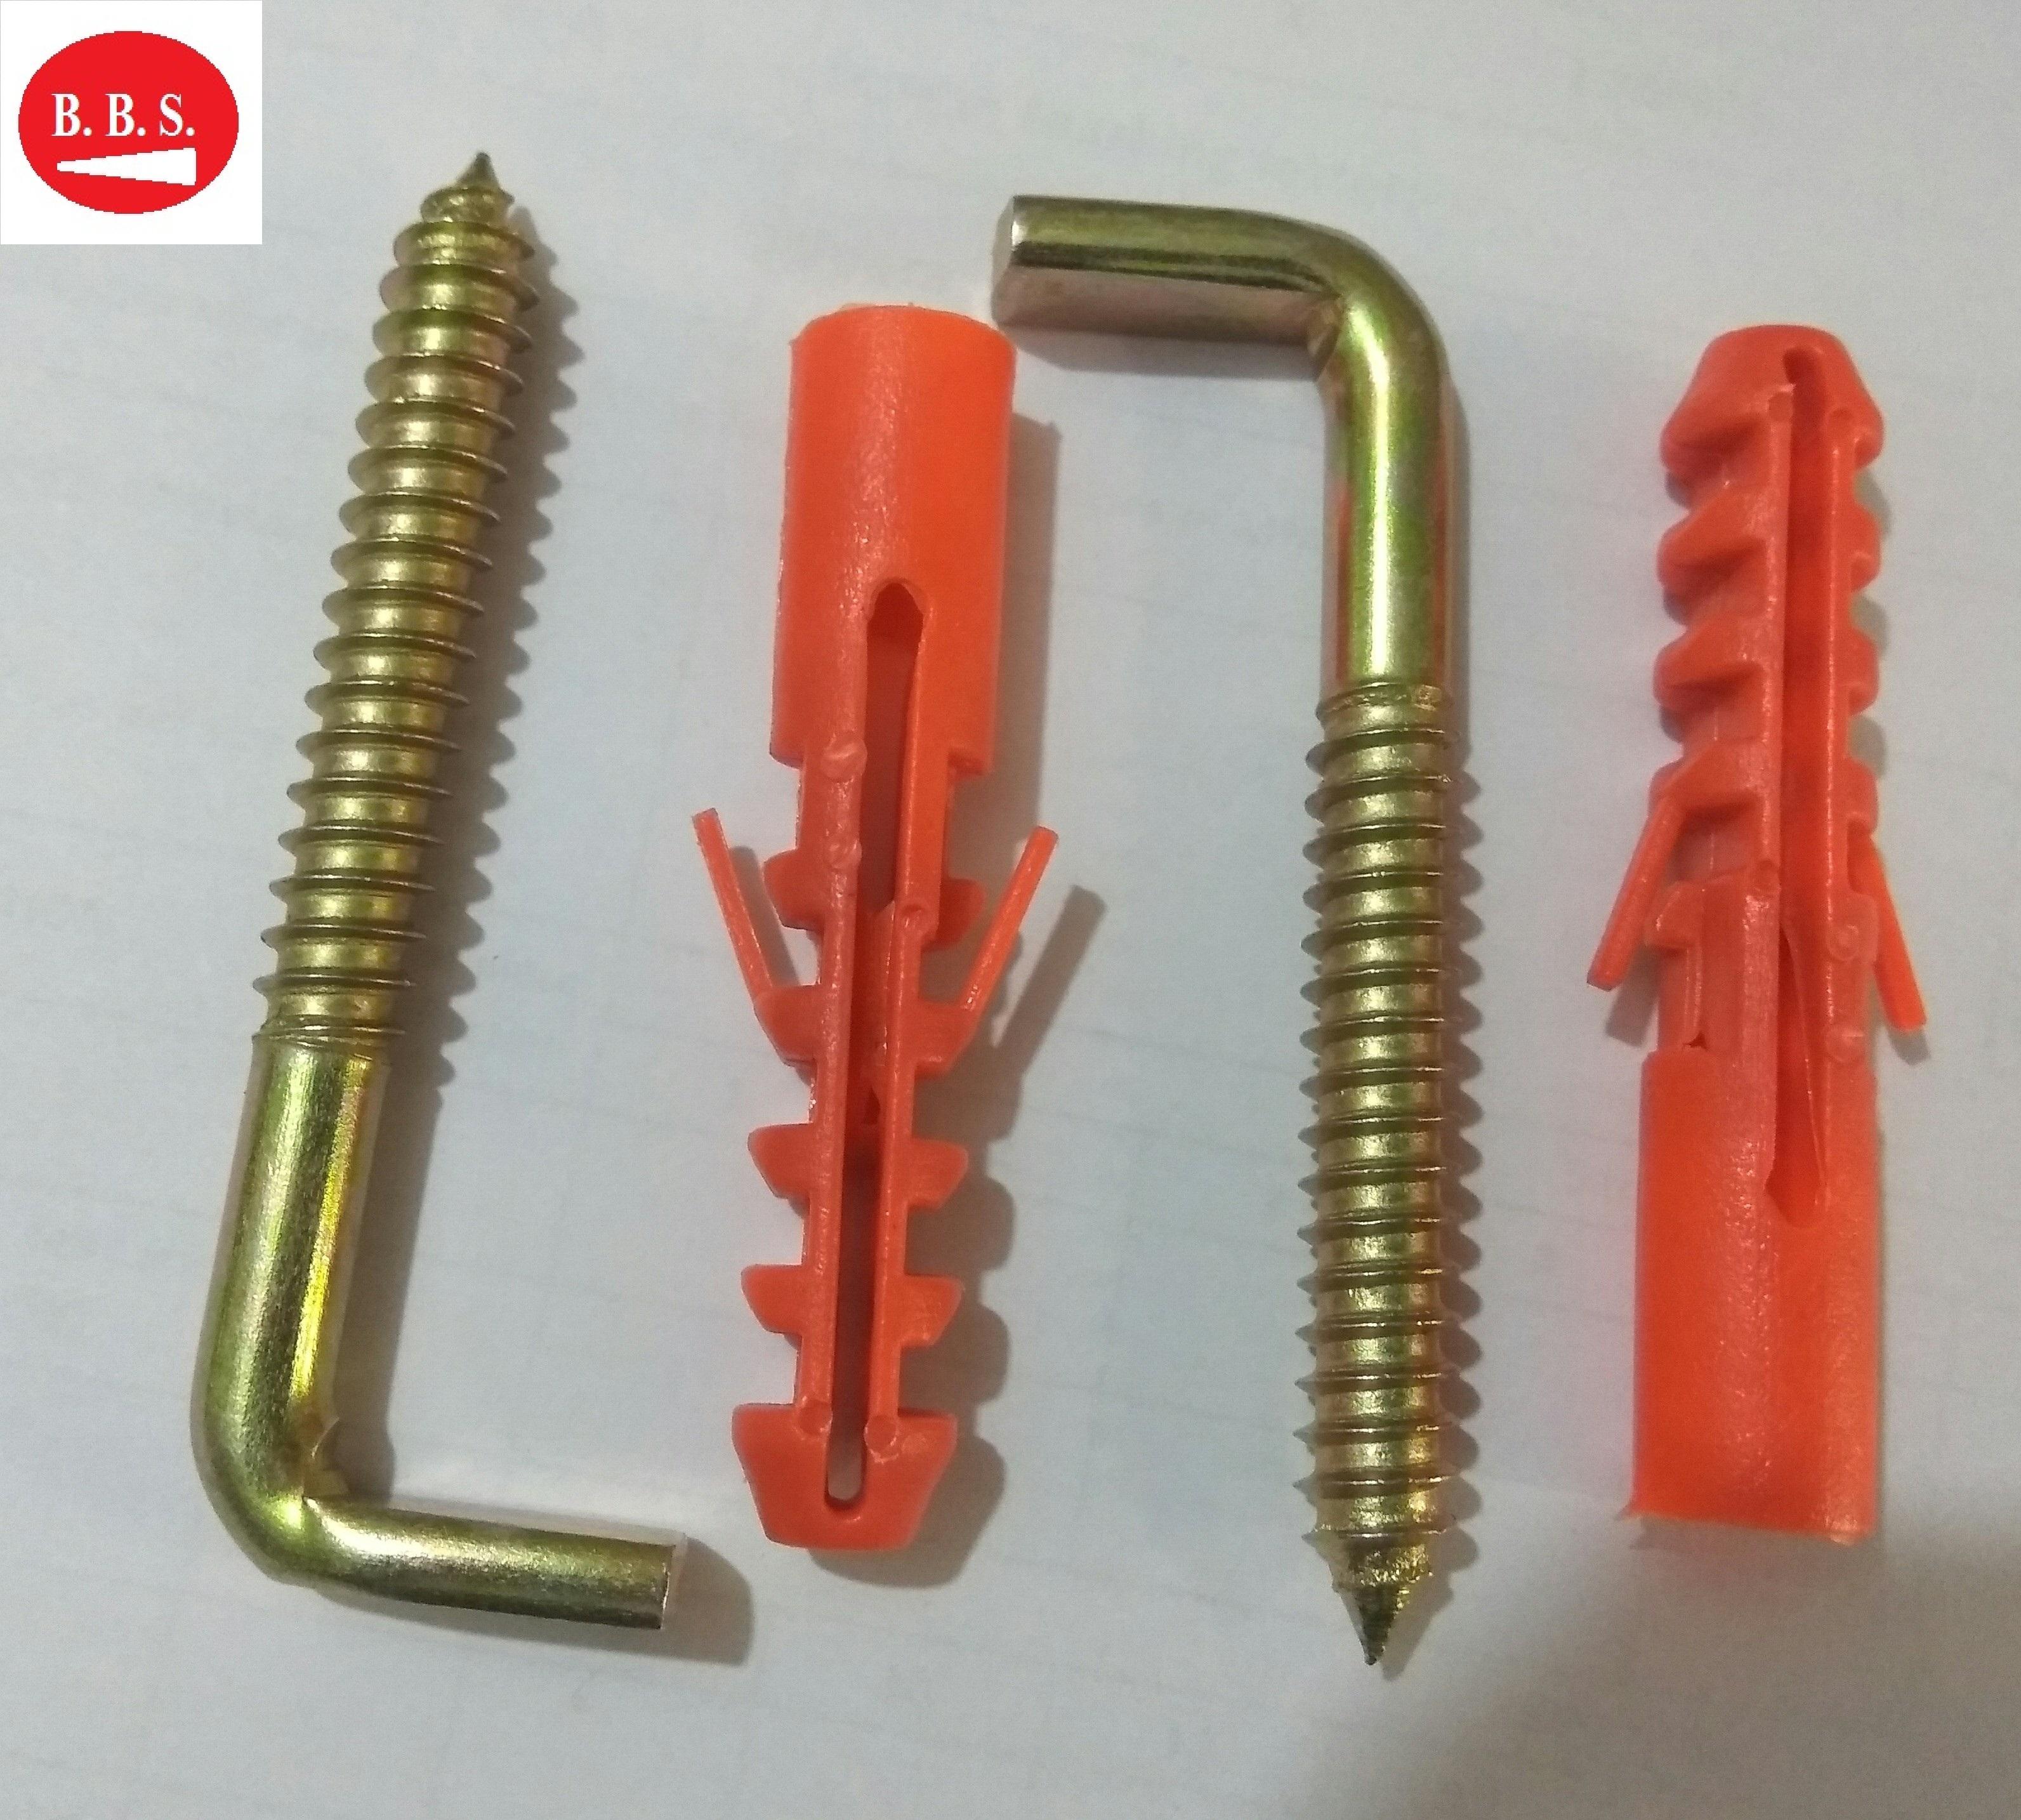 L- type Heater screw